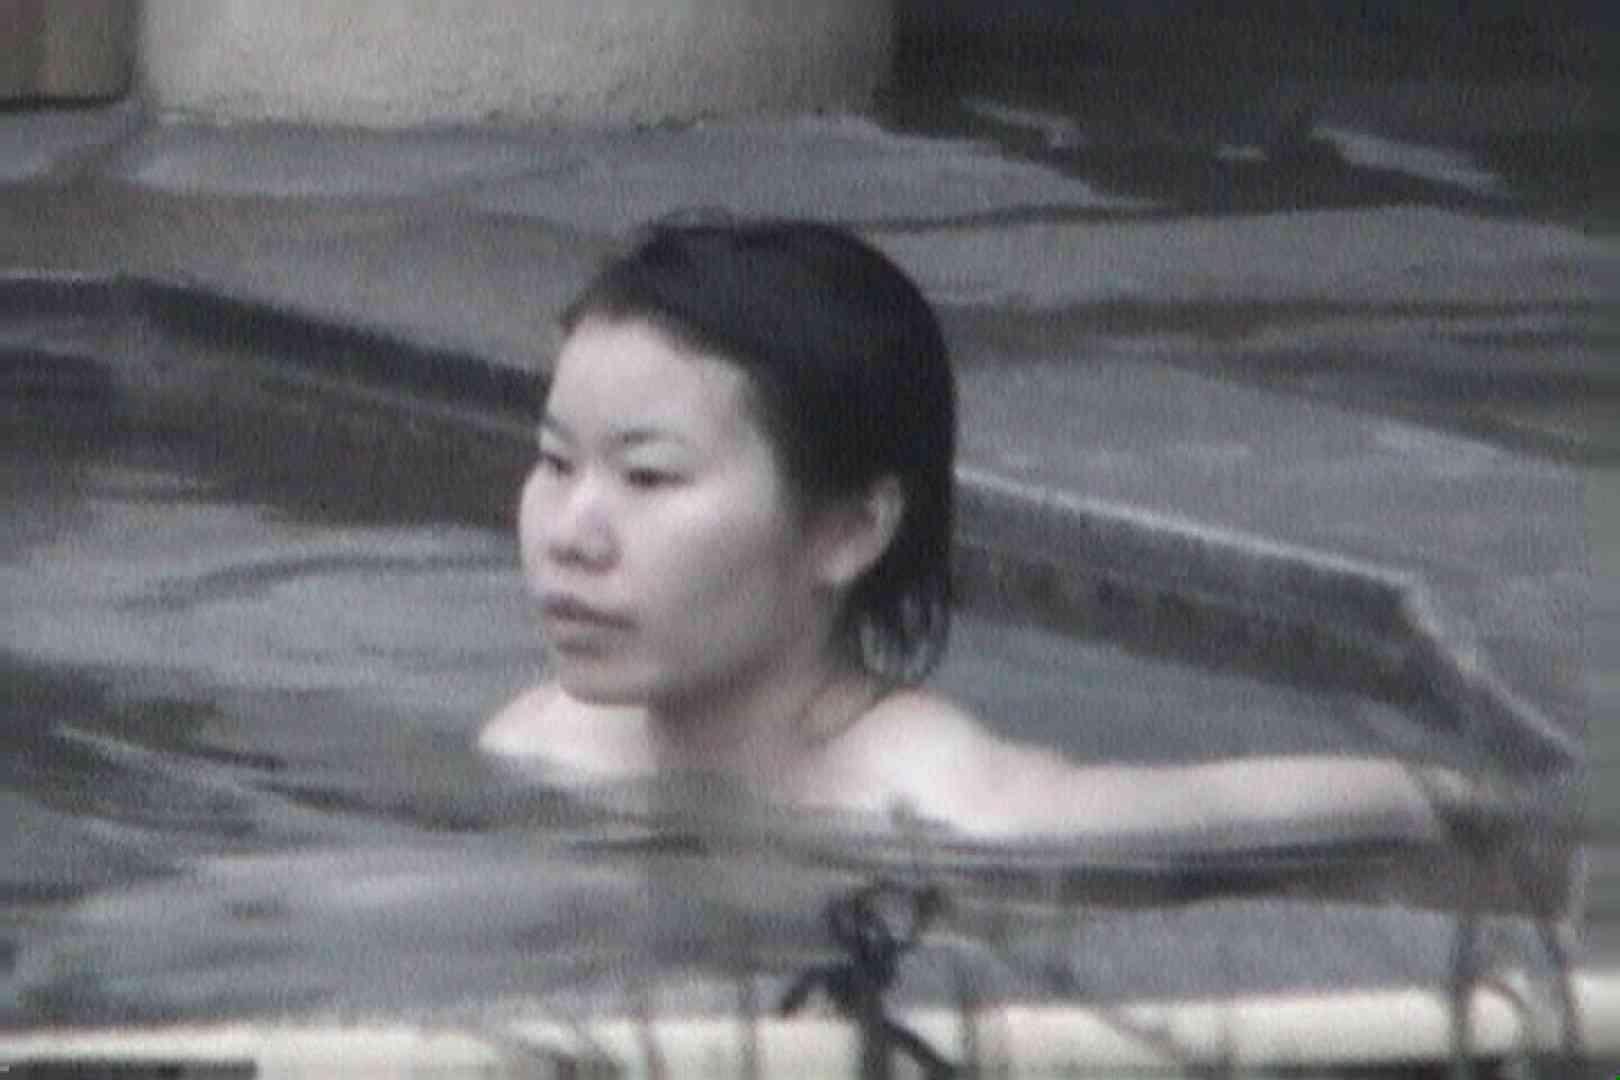 Aquaな露天風呂Vol.556 美しいOLの裸体 すけべAV動画紹介 69pic 56